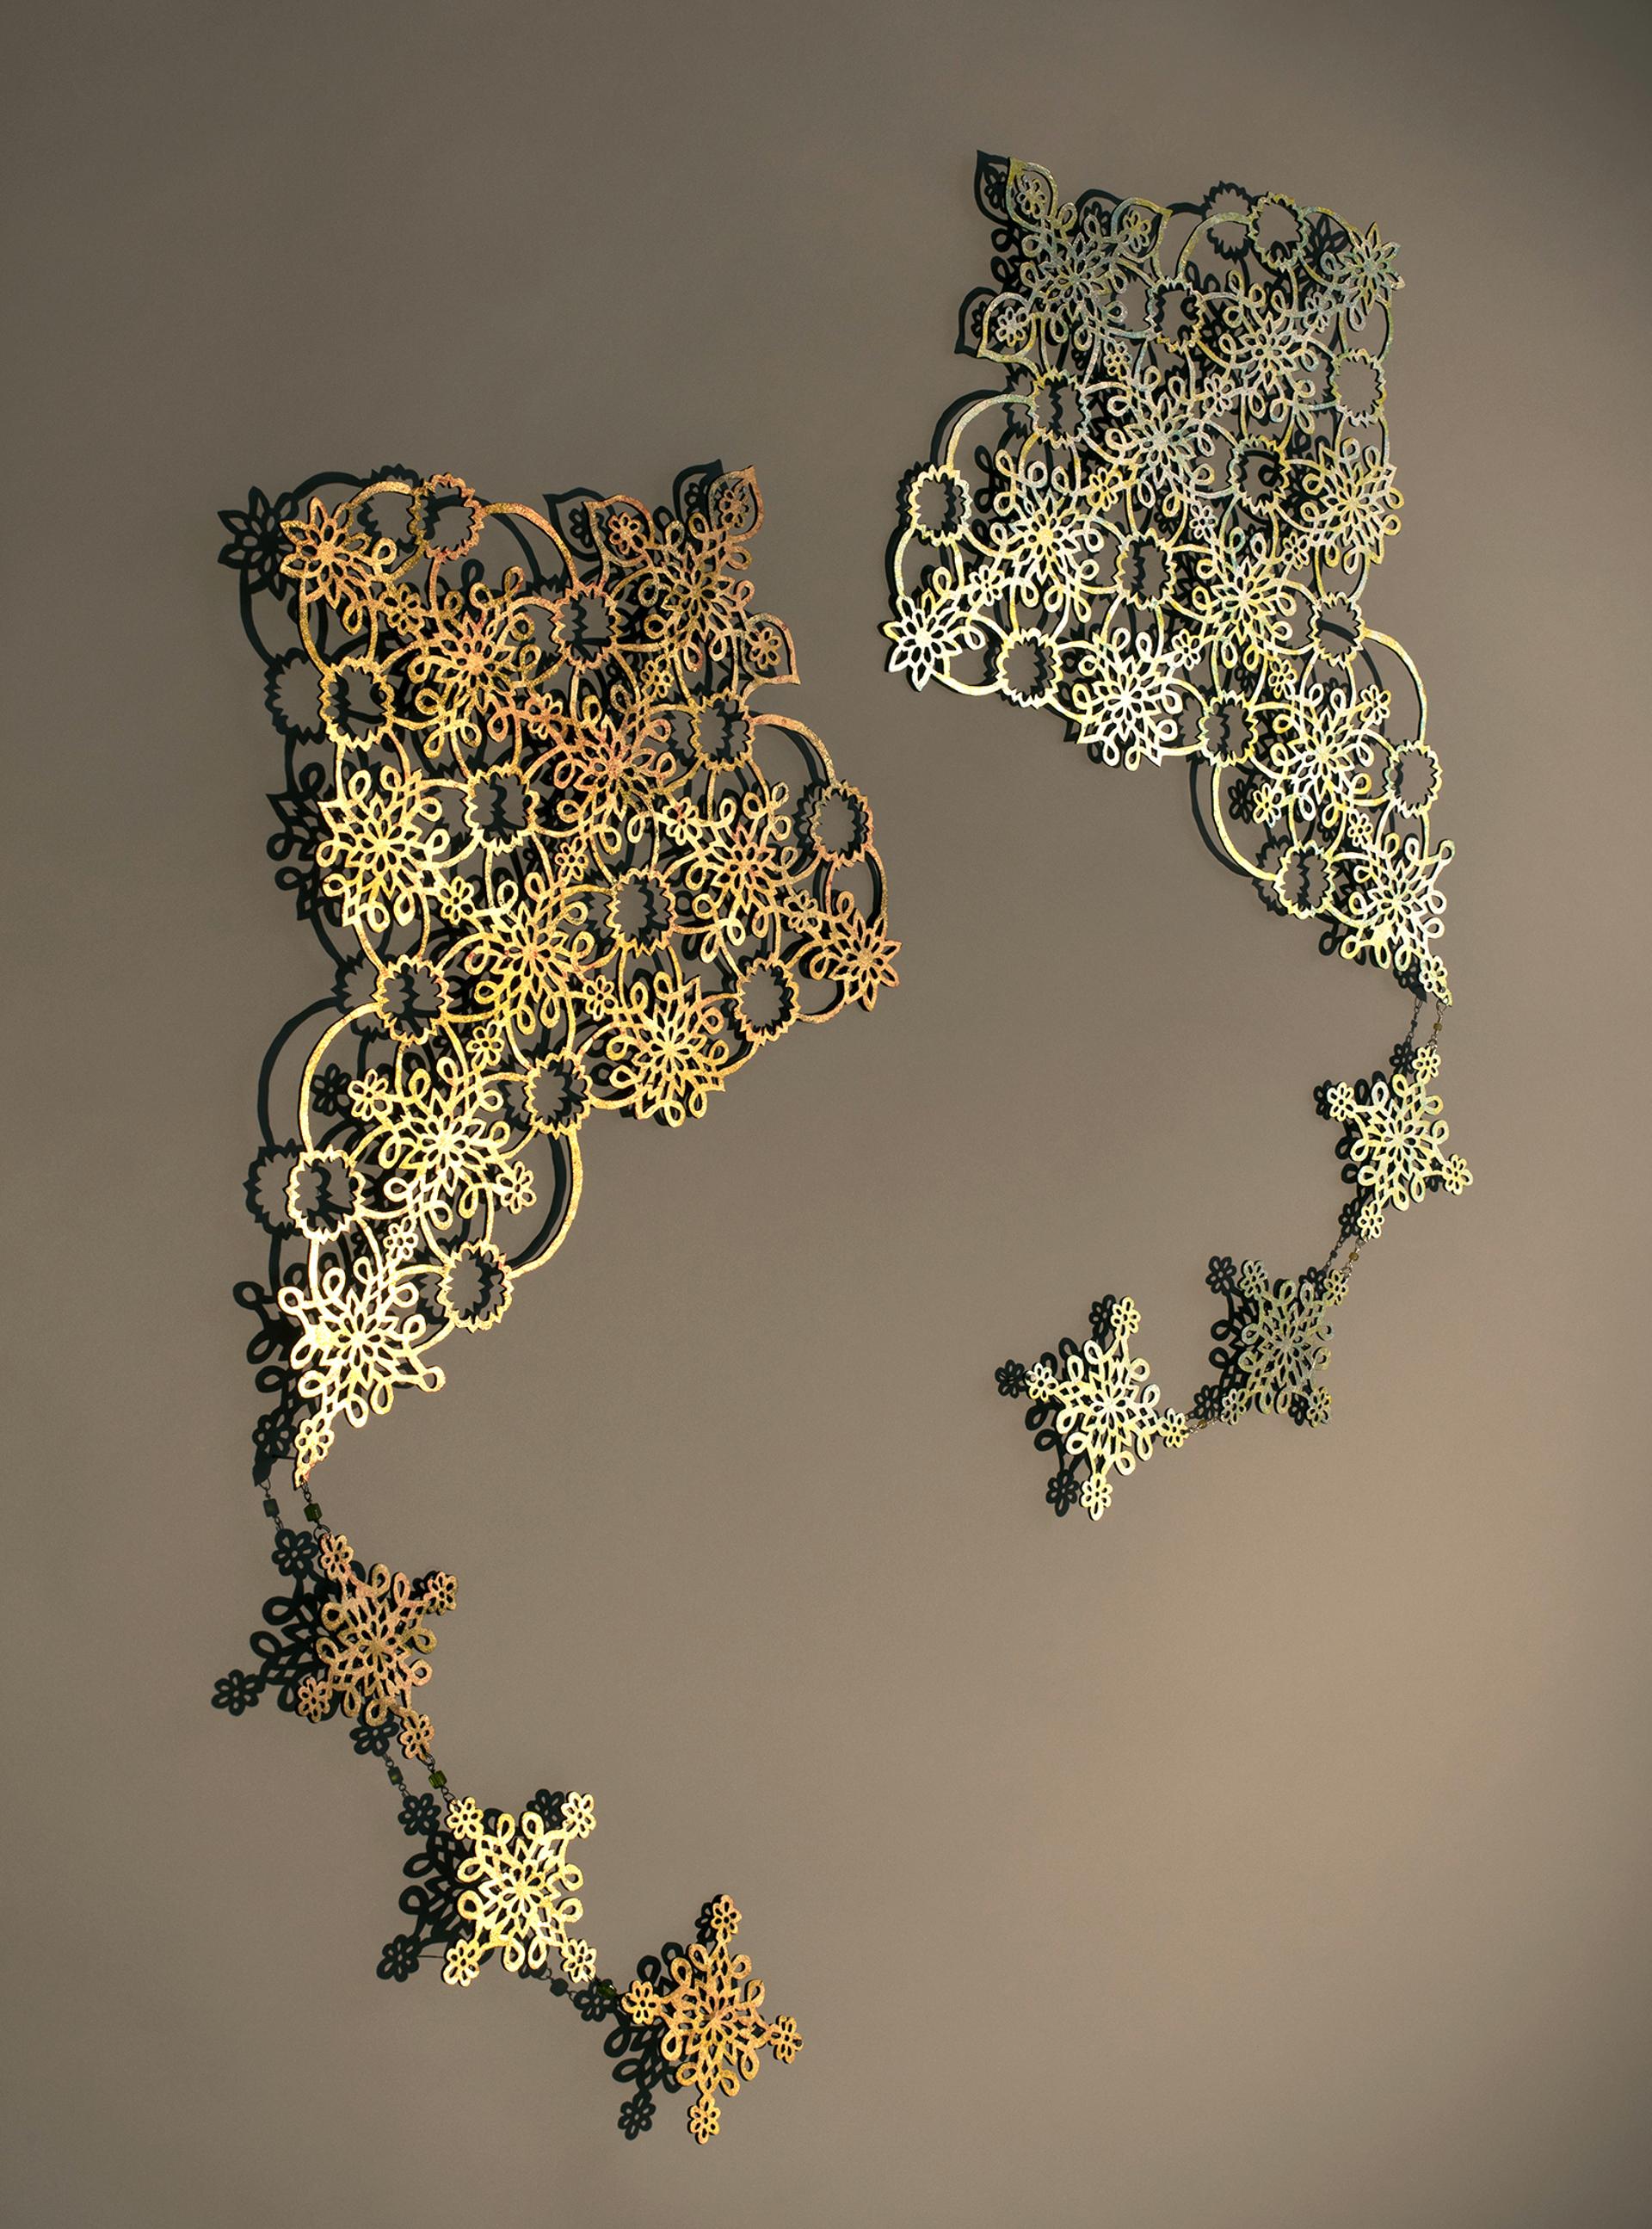 Kite (Gold) by June Sekiguchi